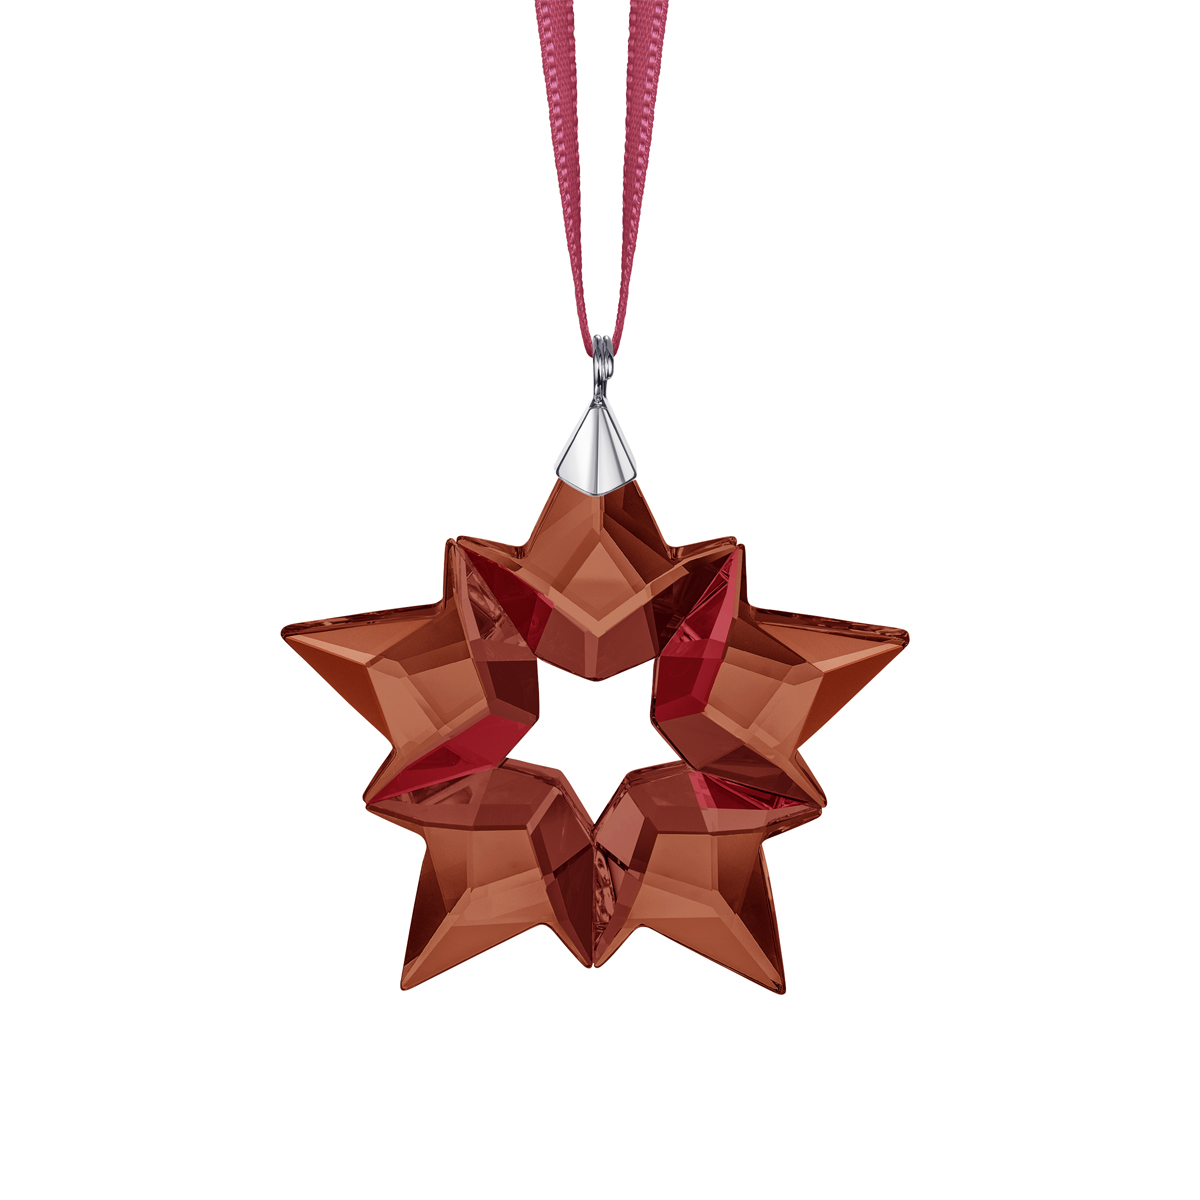 Swarovski Christmas Holiday Ornament 2019 Small